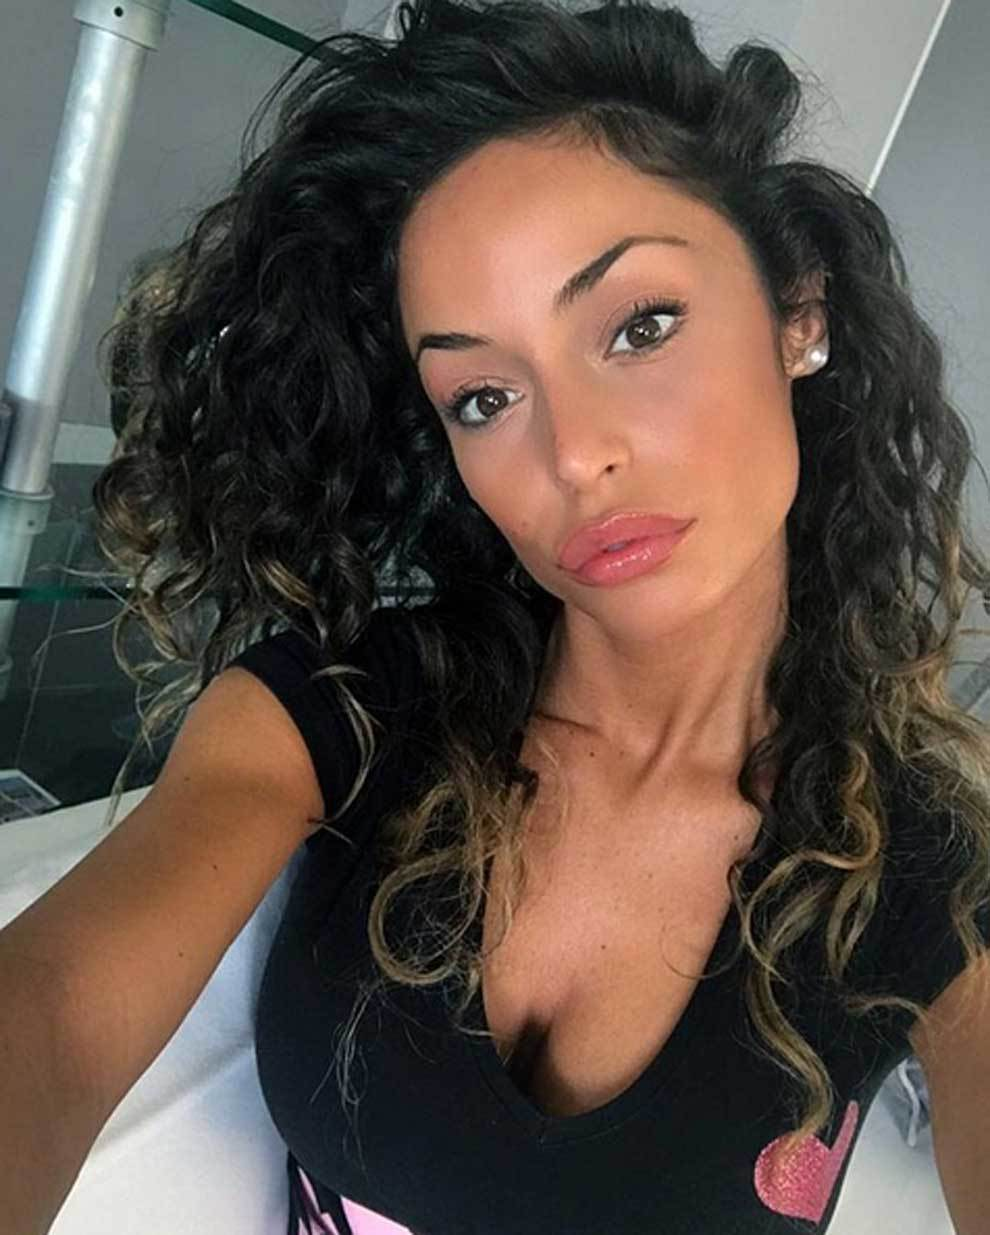 Raffaella Fico nudes (44 photos), images Fappening, Snapchat, underwear 2015